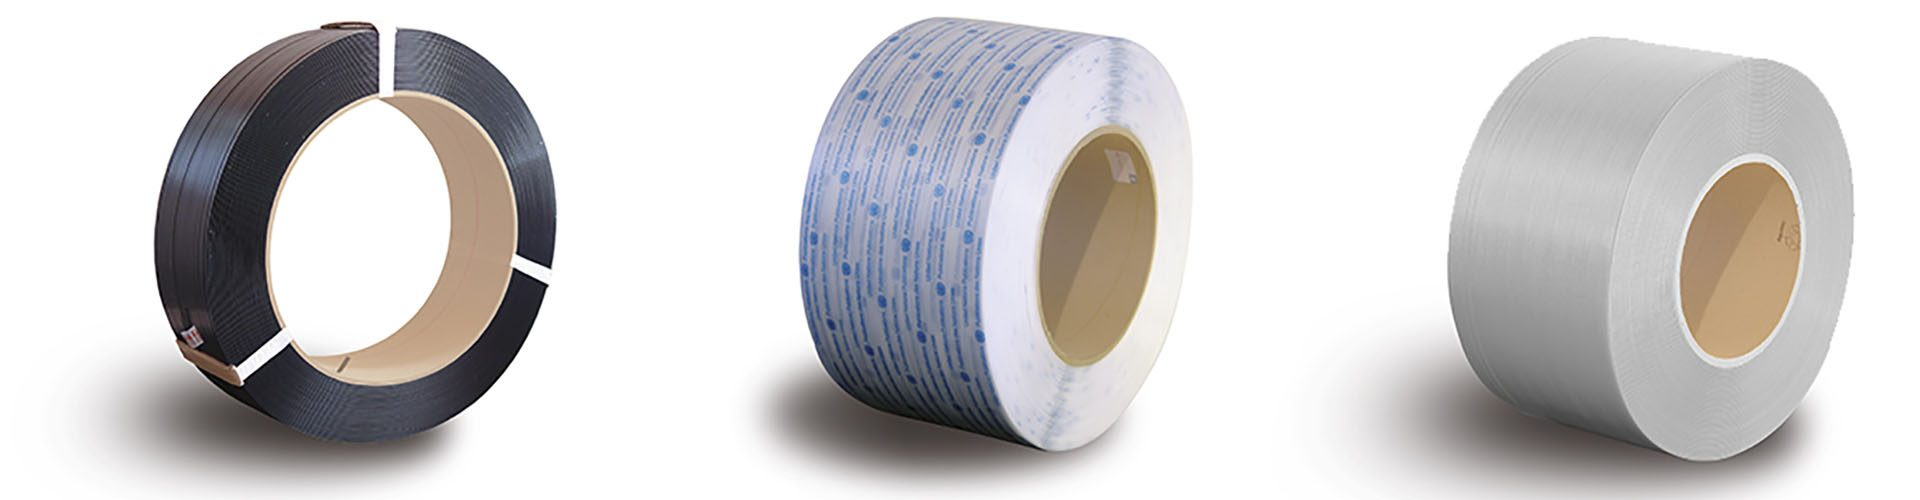 Pakkausmateriaalit ja -tarvikkeet edullisesti - MJ Pakkaus Oy